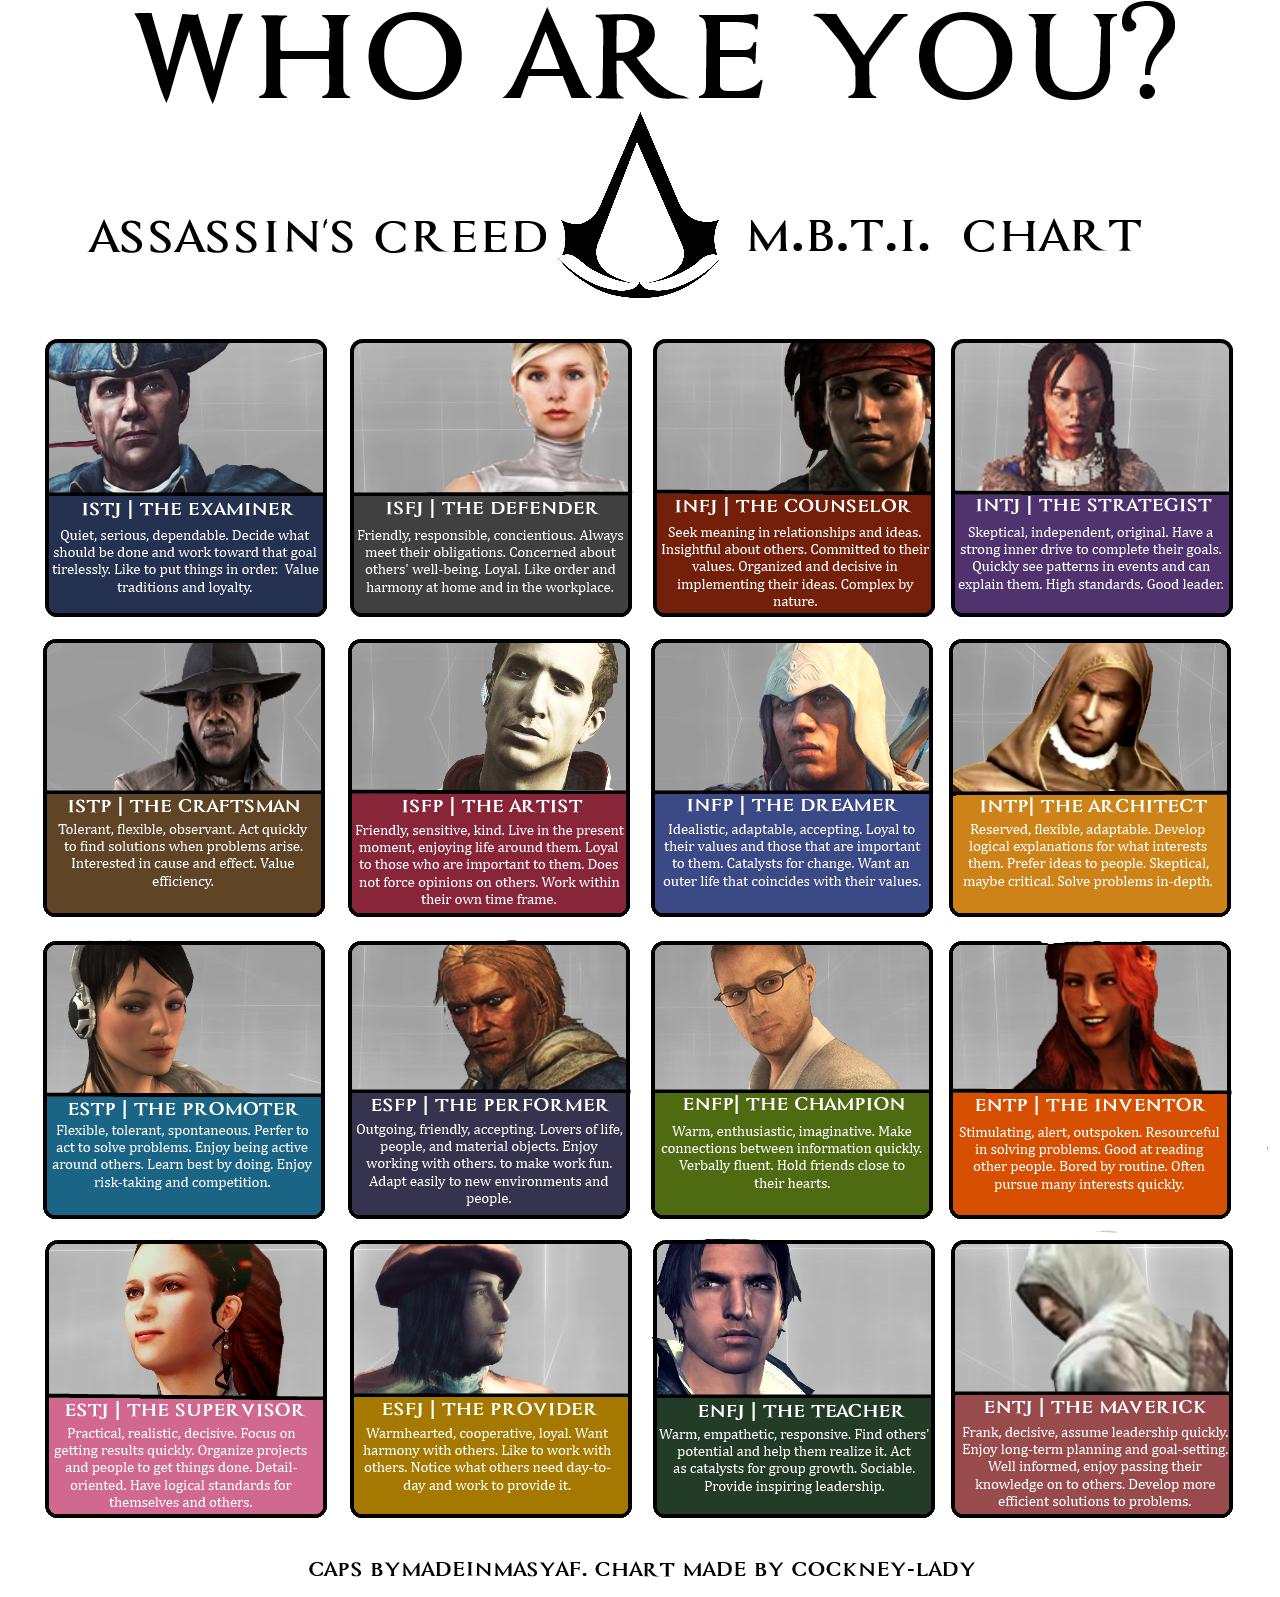 Assasin's Creed MBTI Chart | Myers-Briggs Type Indicator